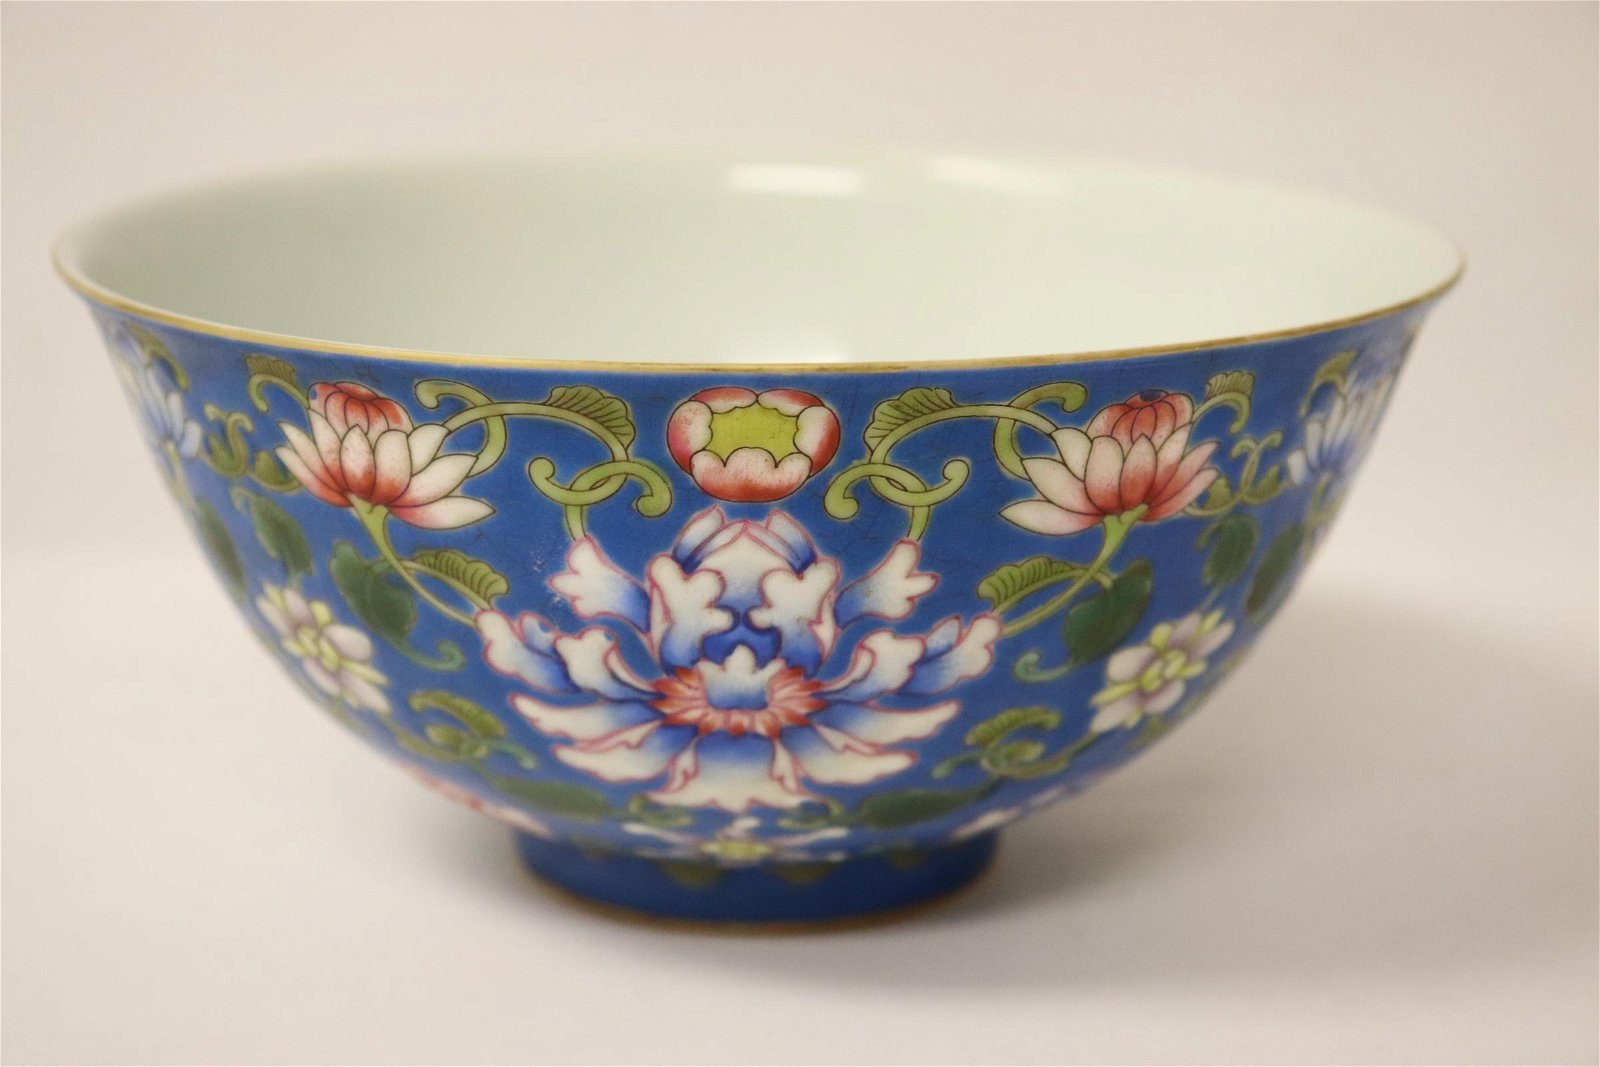 A beautiful famille rose porcelain bowl